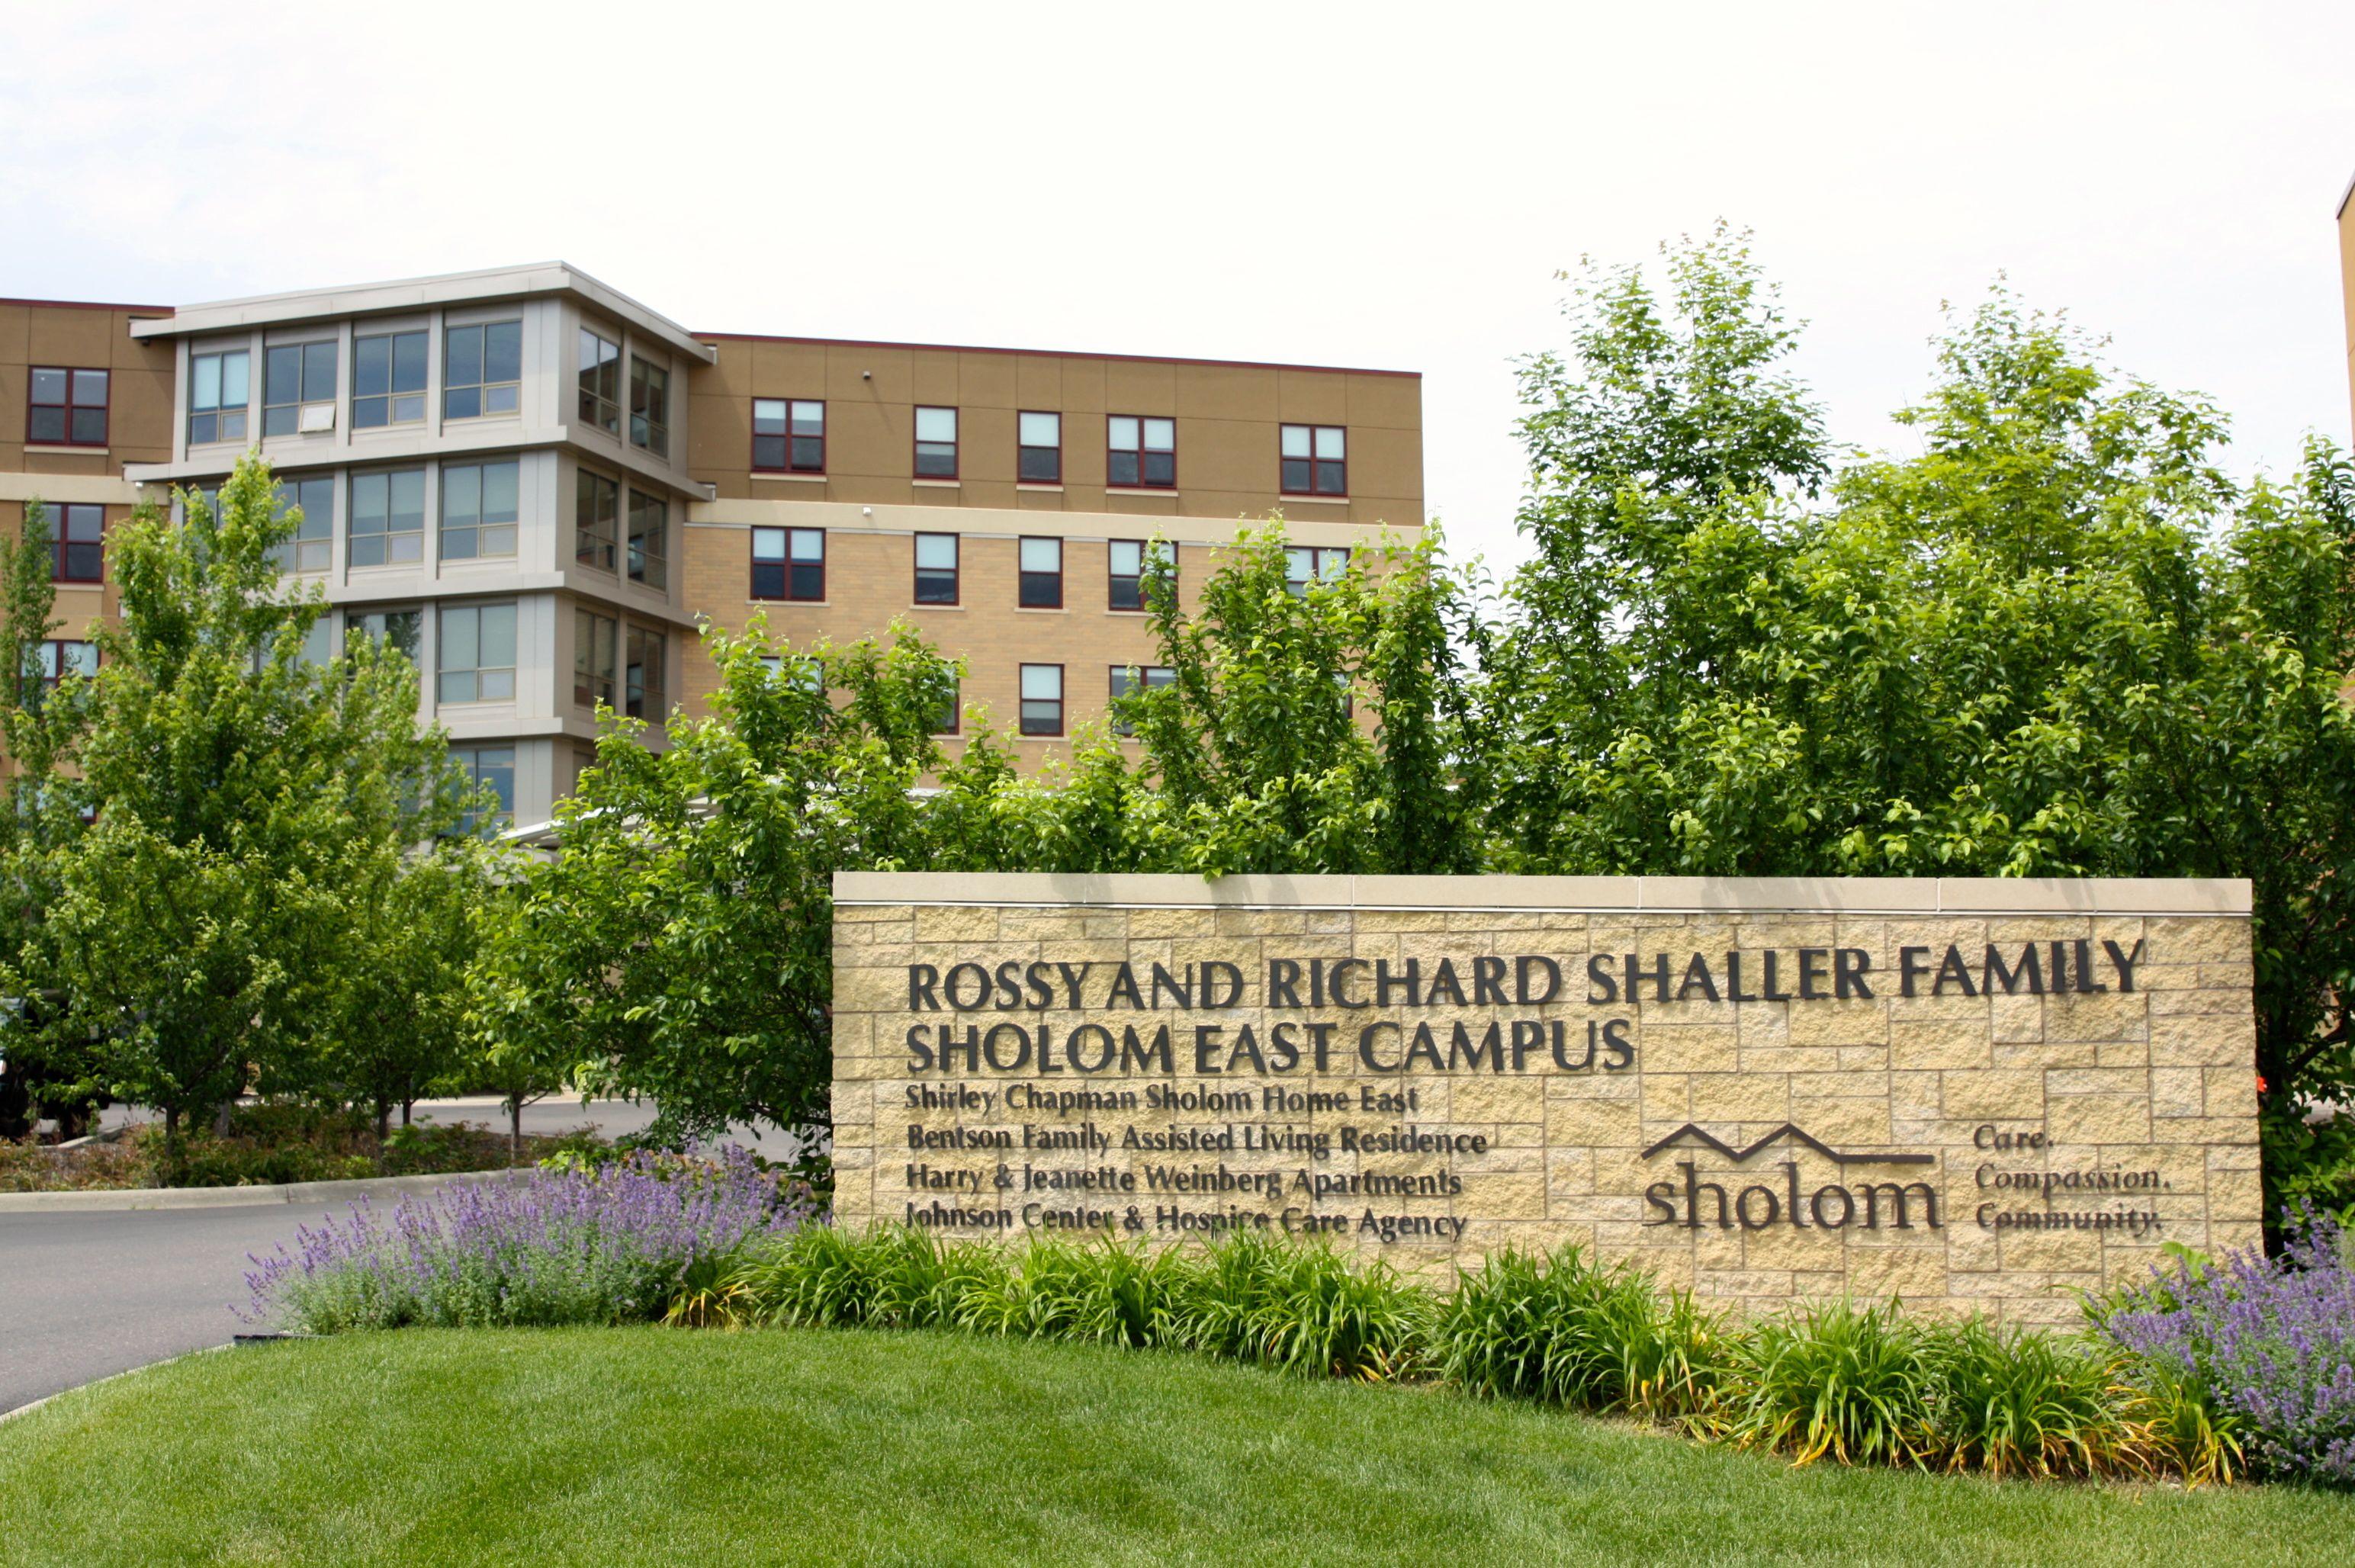 Elegant 5. Shaller Family Sholom East Campus Check Availability